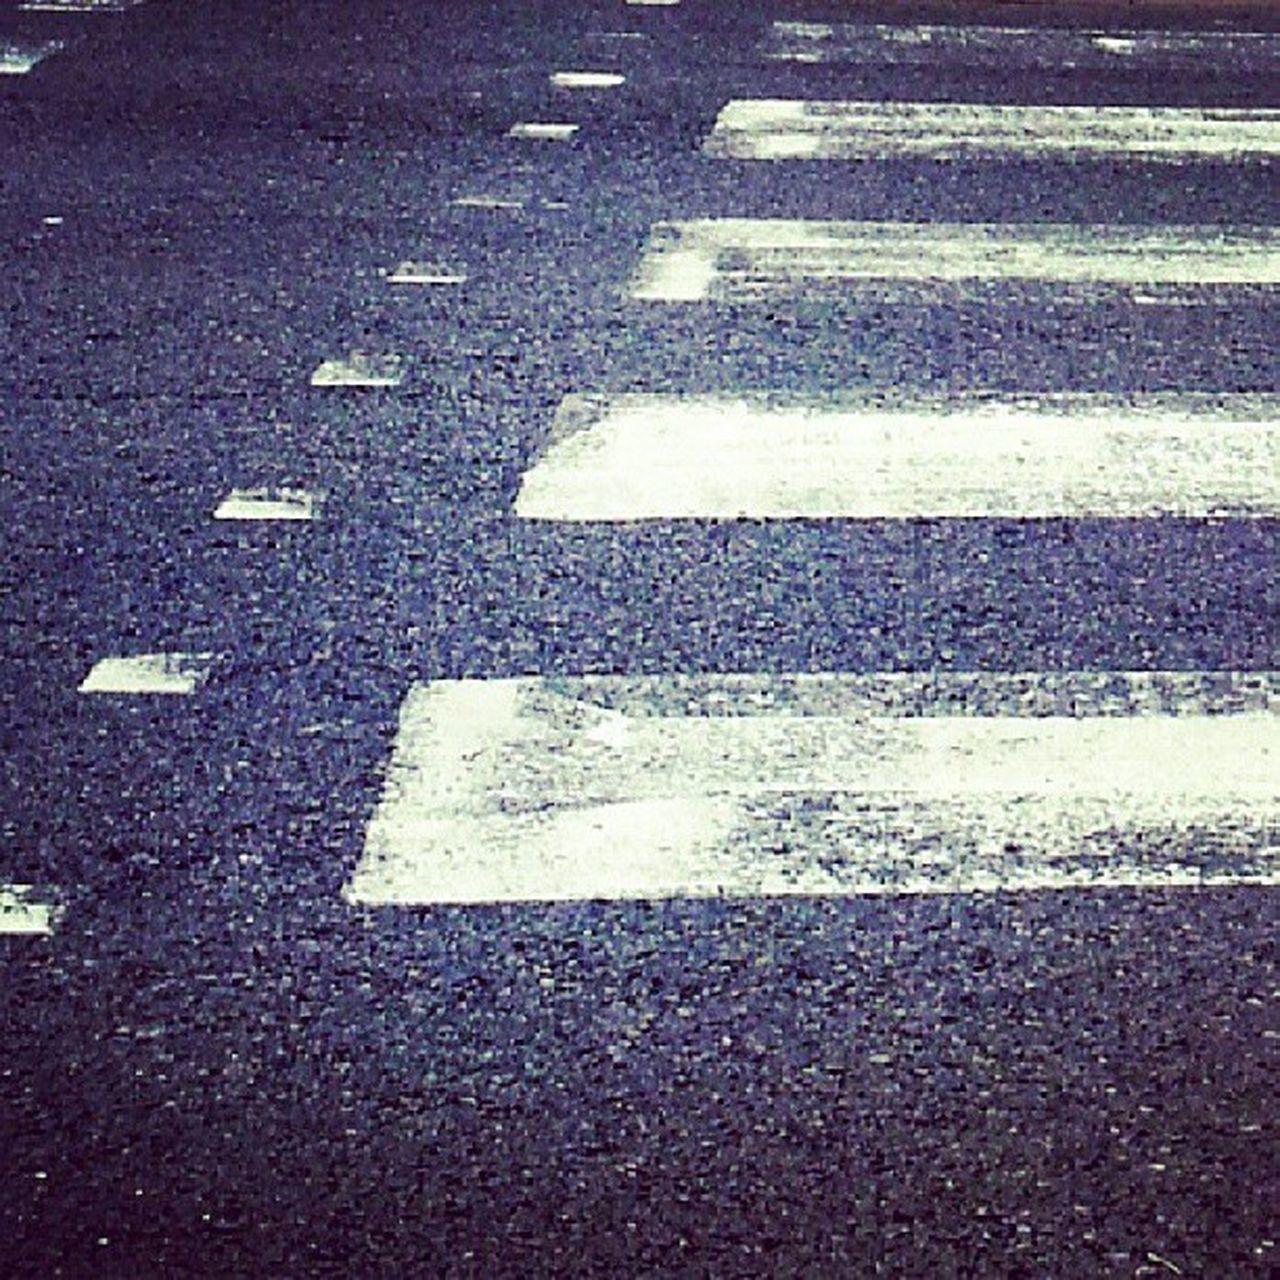 road marking, asphalt, street, transportation, road, backgrounds, white line, no people, textured, day, full frame, outdoors, marking, line, city, close-up